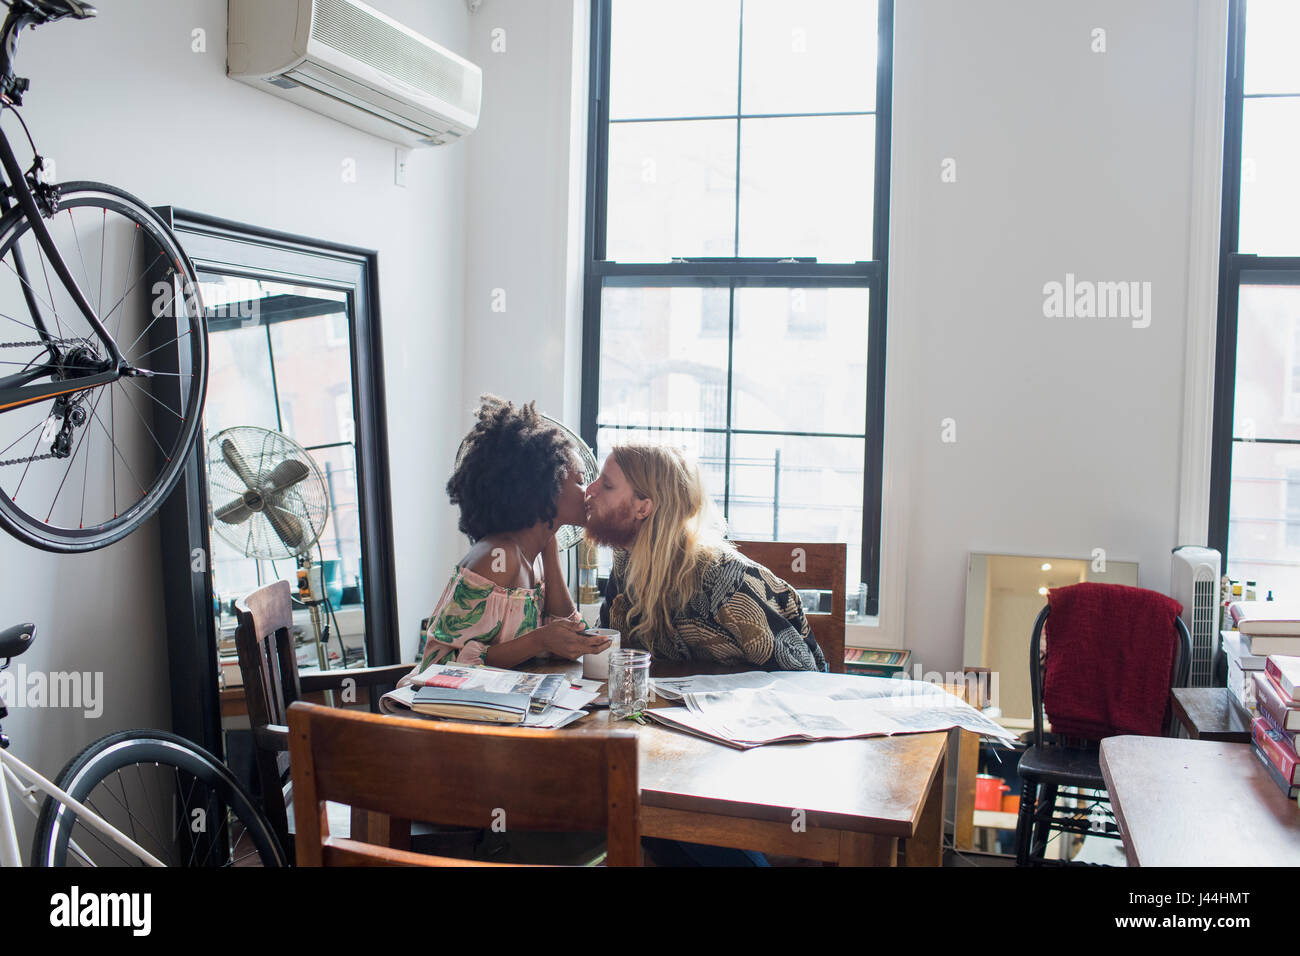 Una joven pareja besándose en una mesa de comedor Imagen De Stock